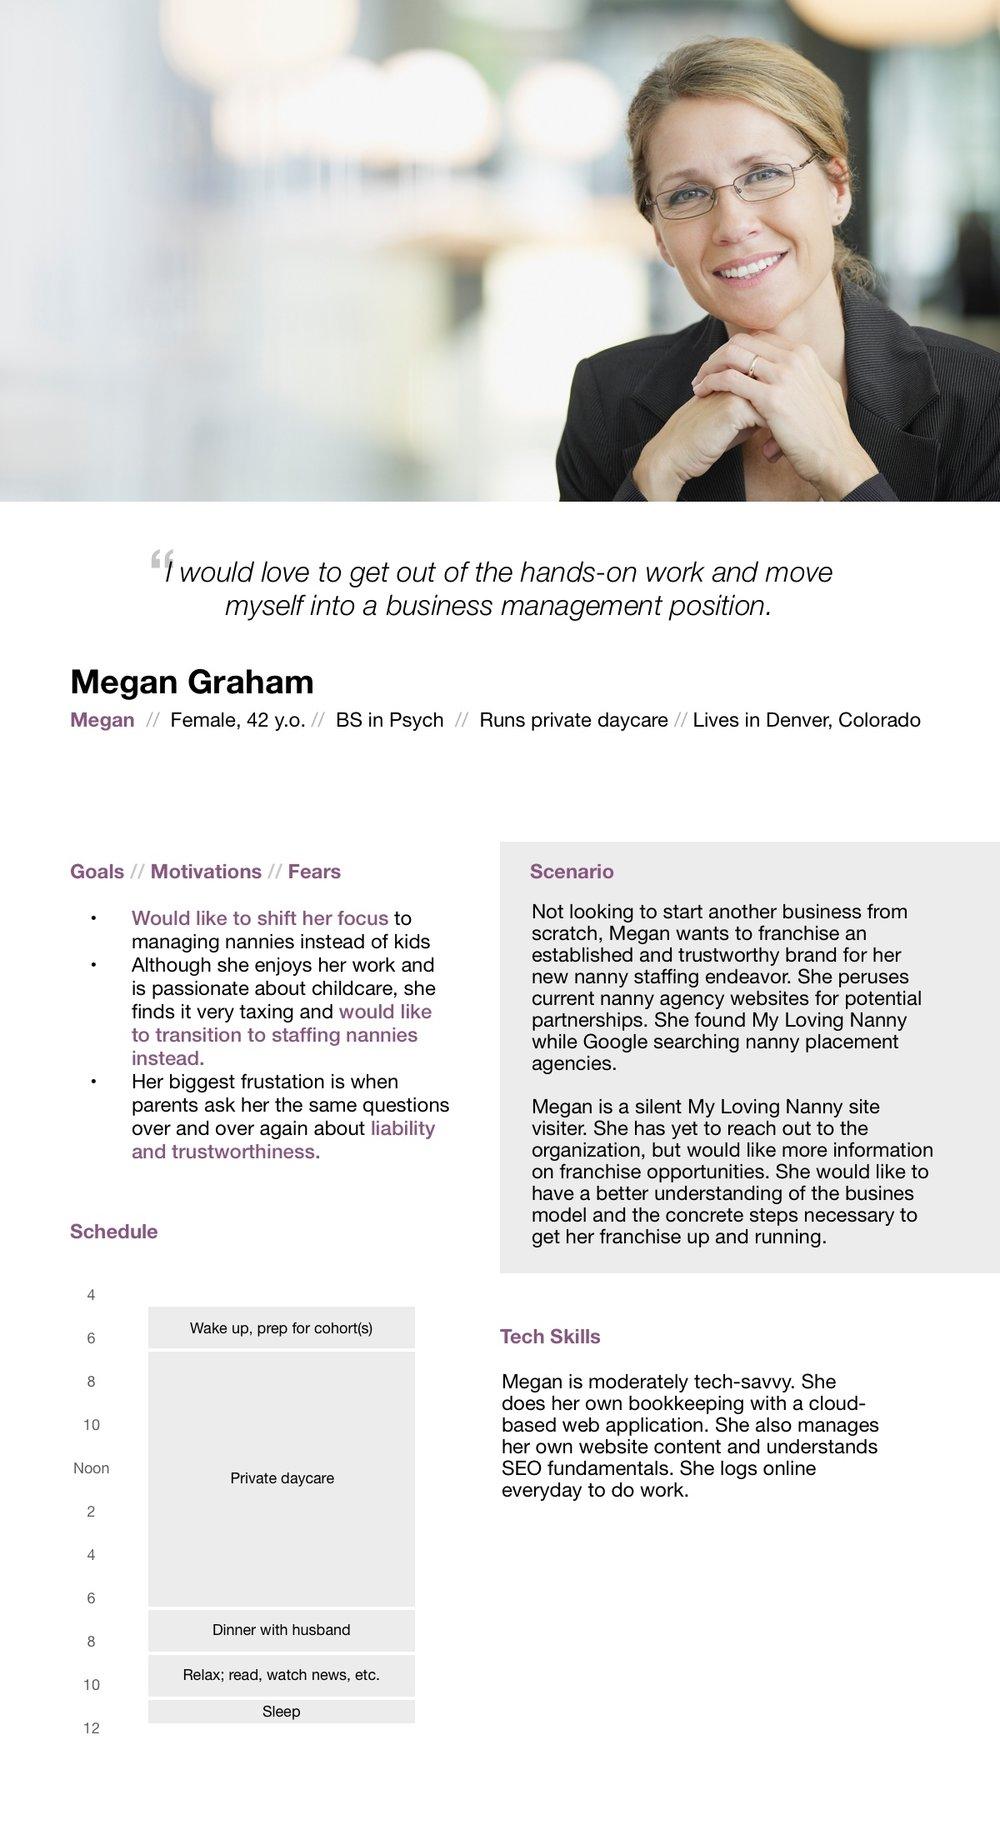 Business persona.jpg